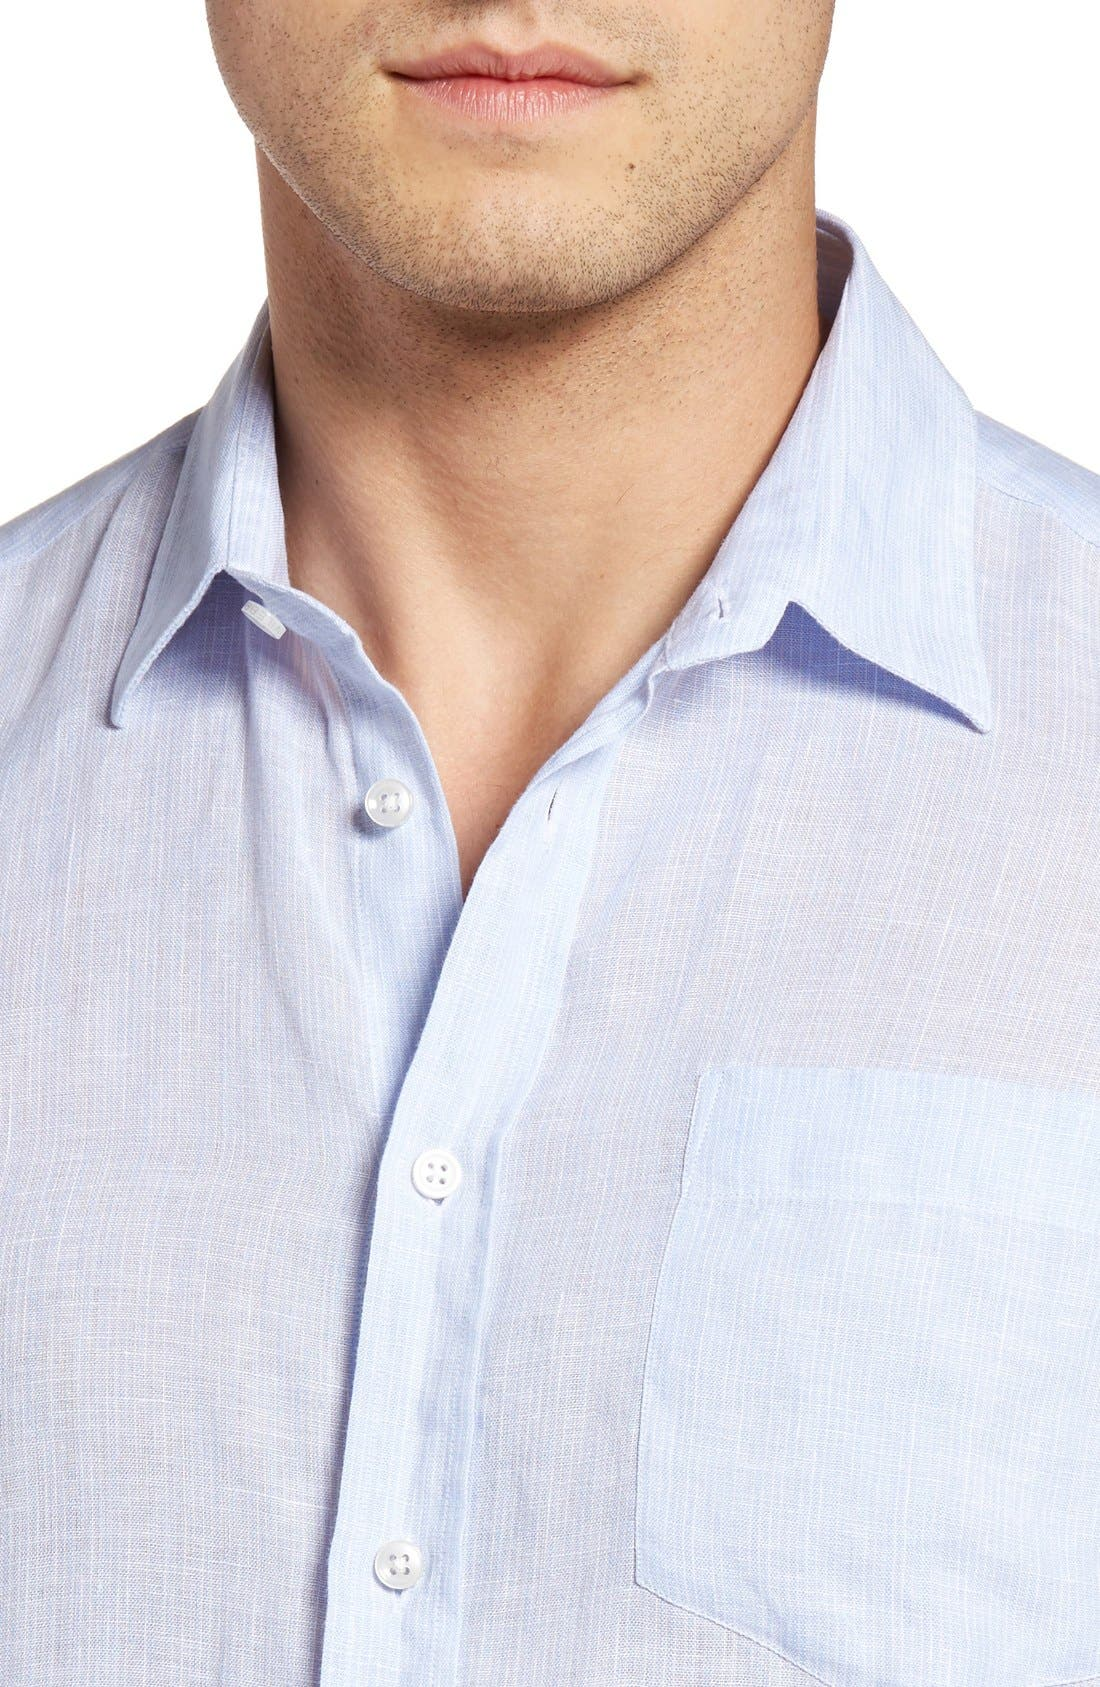 Regular Fit Linen Sport Shirt,                             Alternate thumbnail 4, color,                             Sky Blue